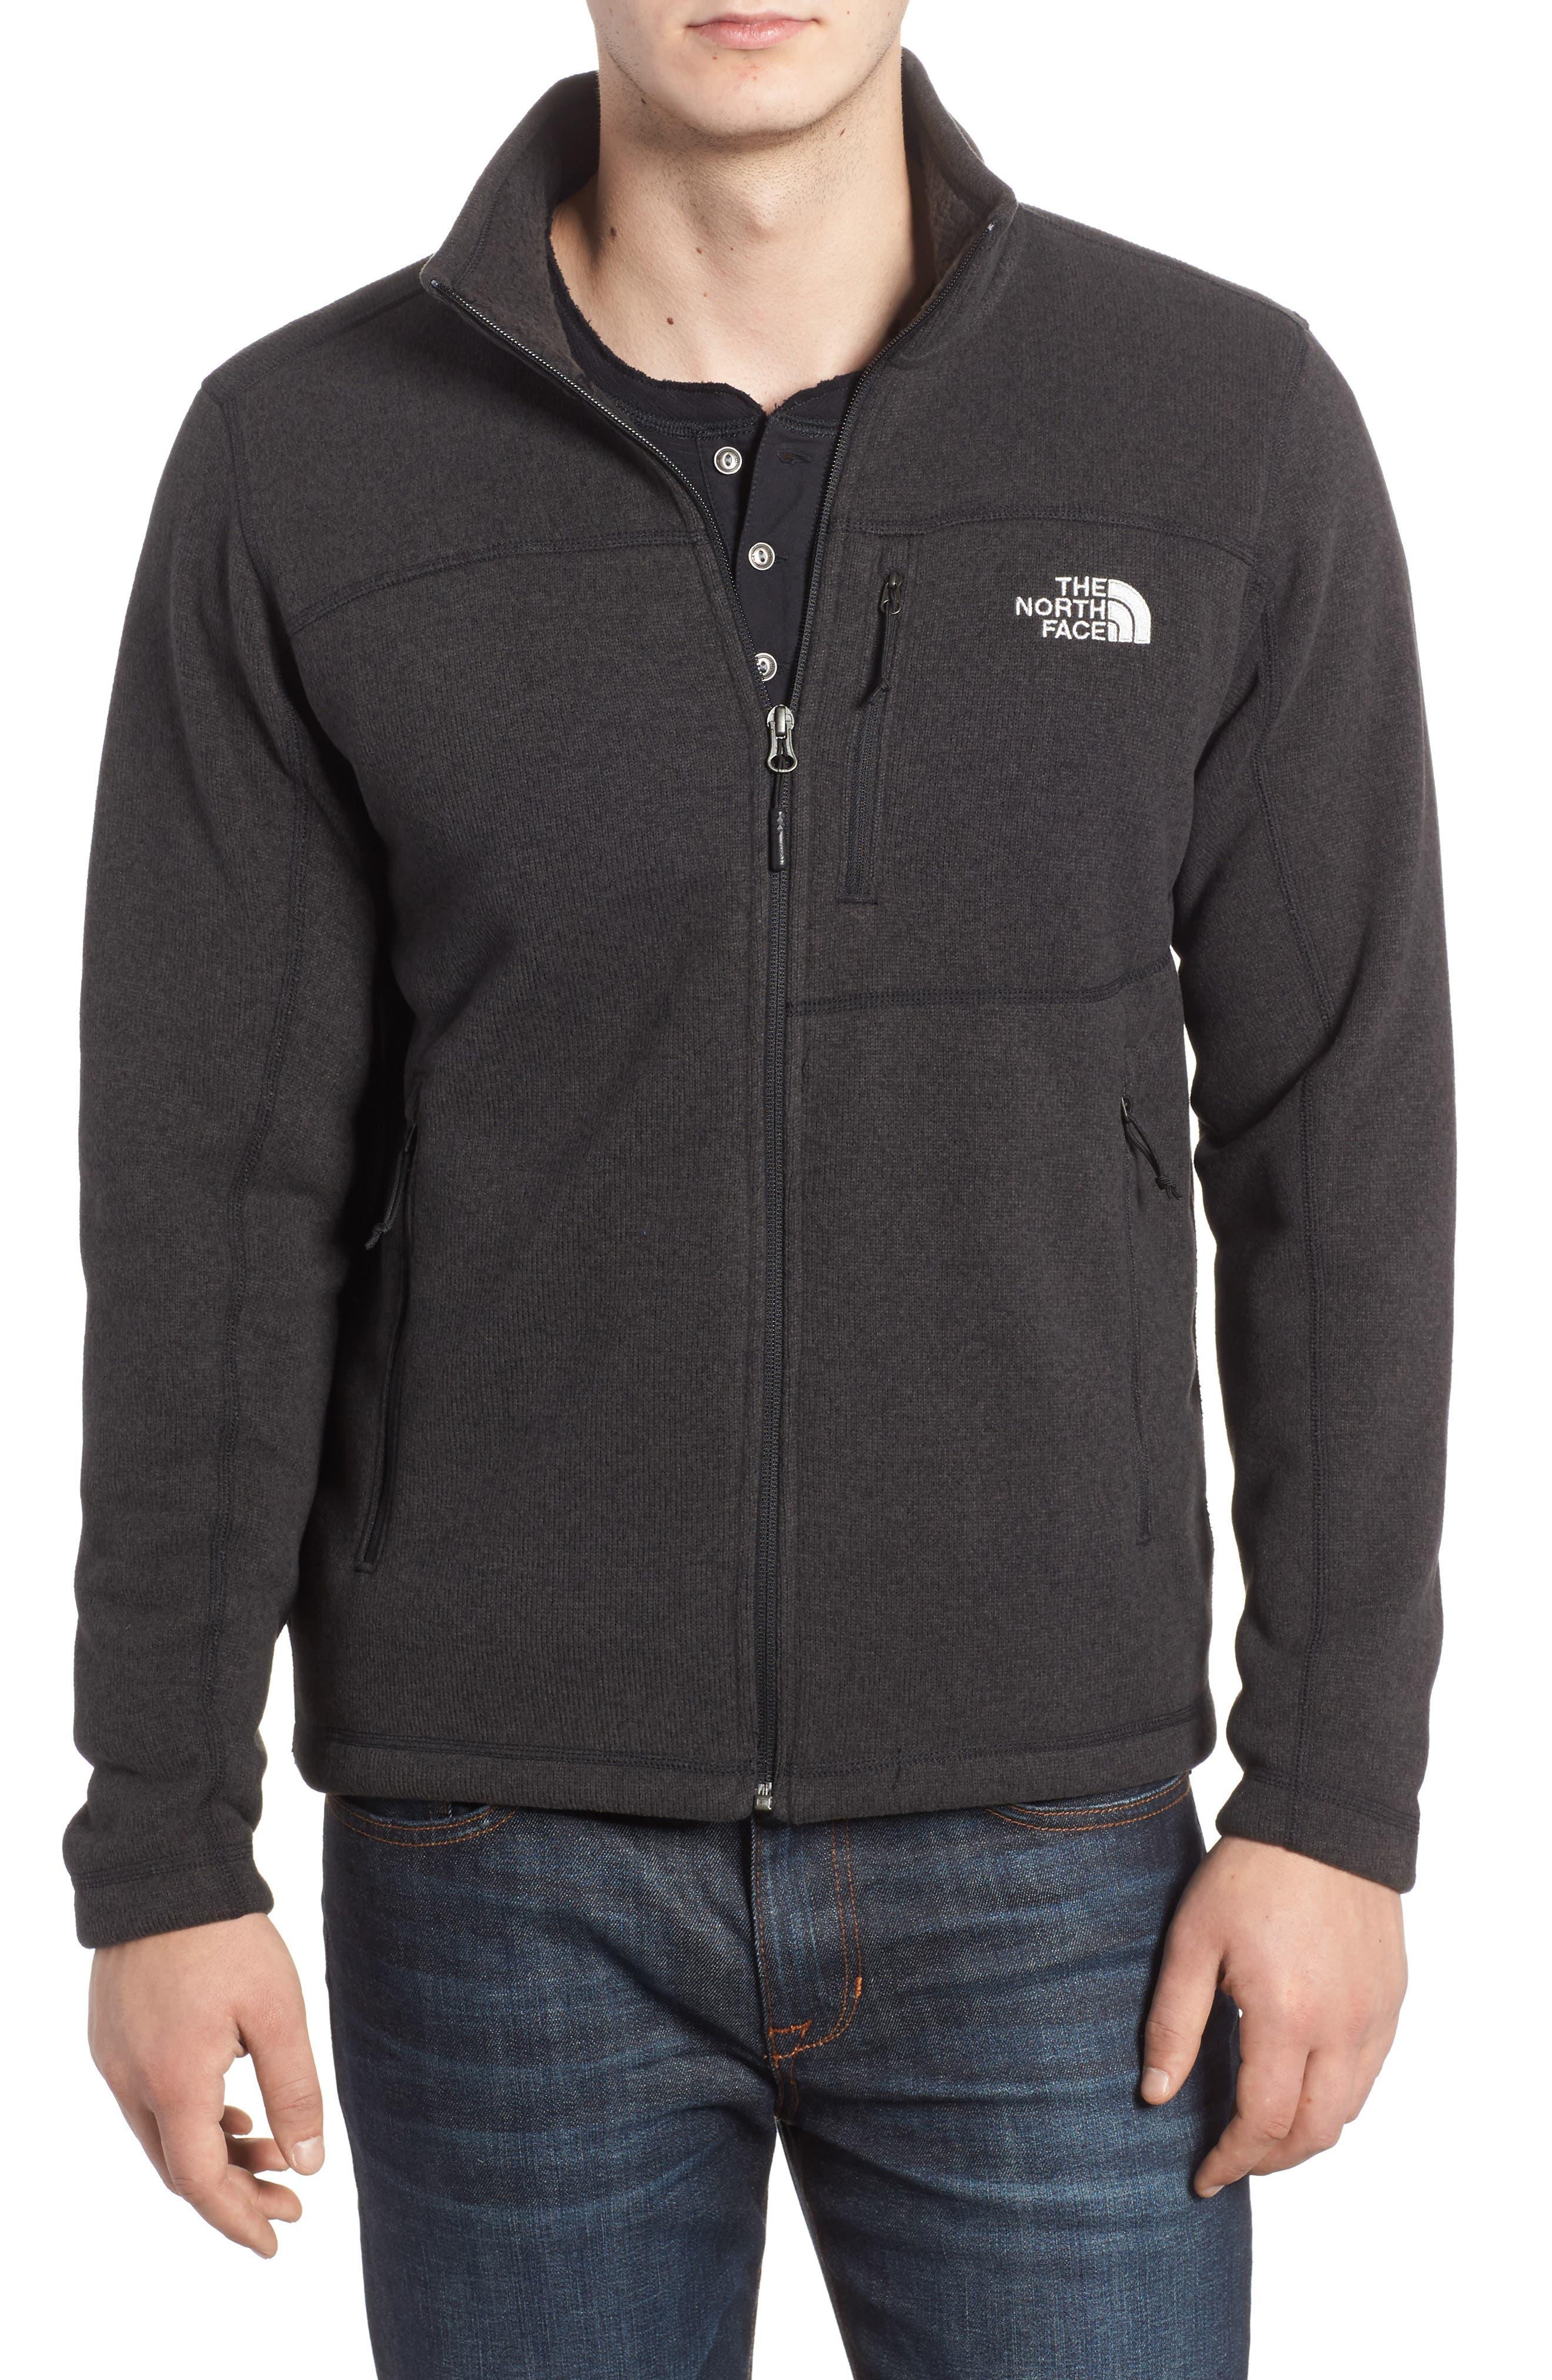 THE NORTH FACE 'Gordon Lyons' Zip Fleece Jacket, Main, color, 001